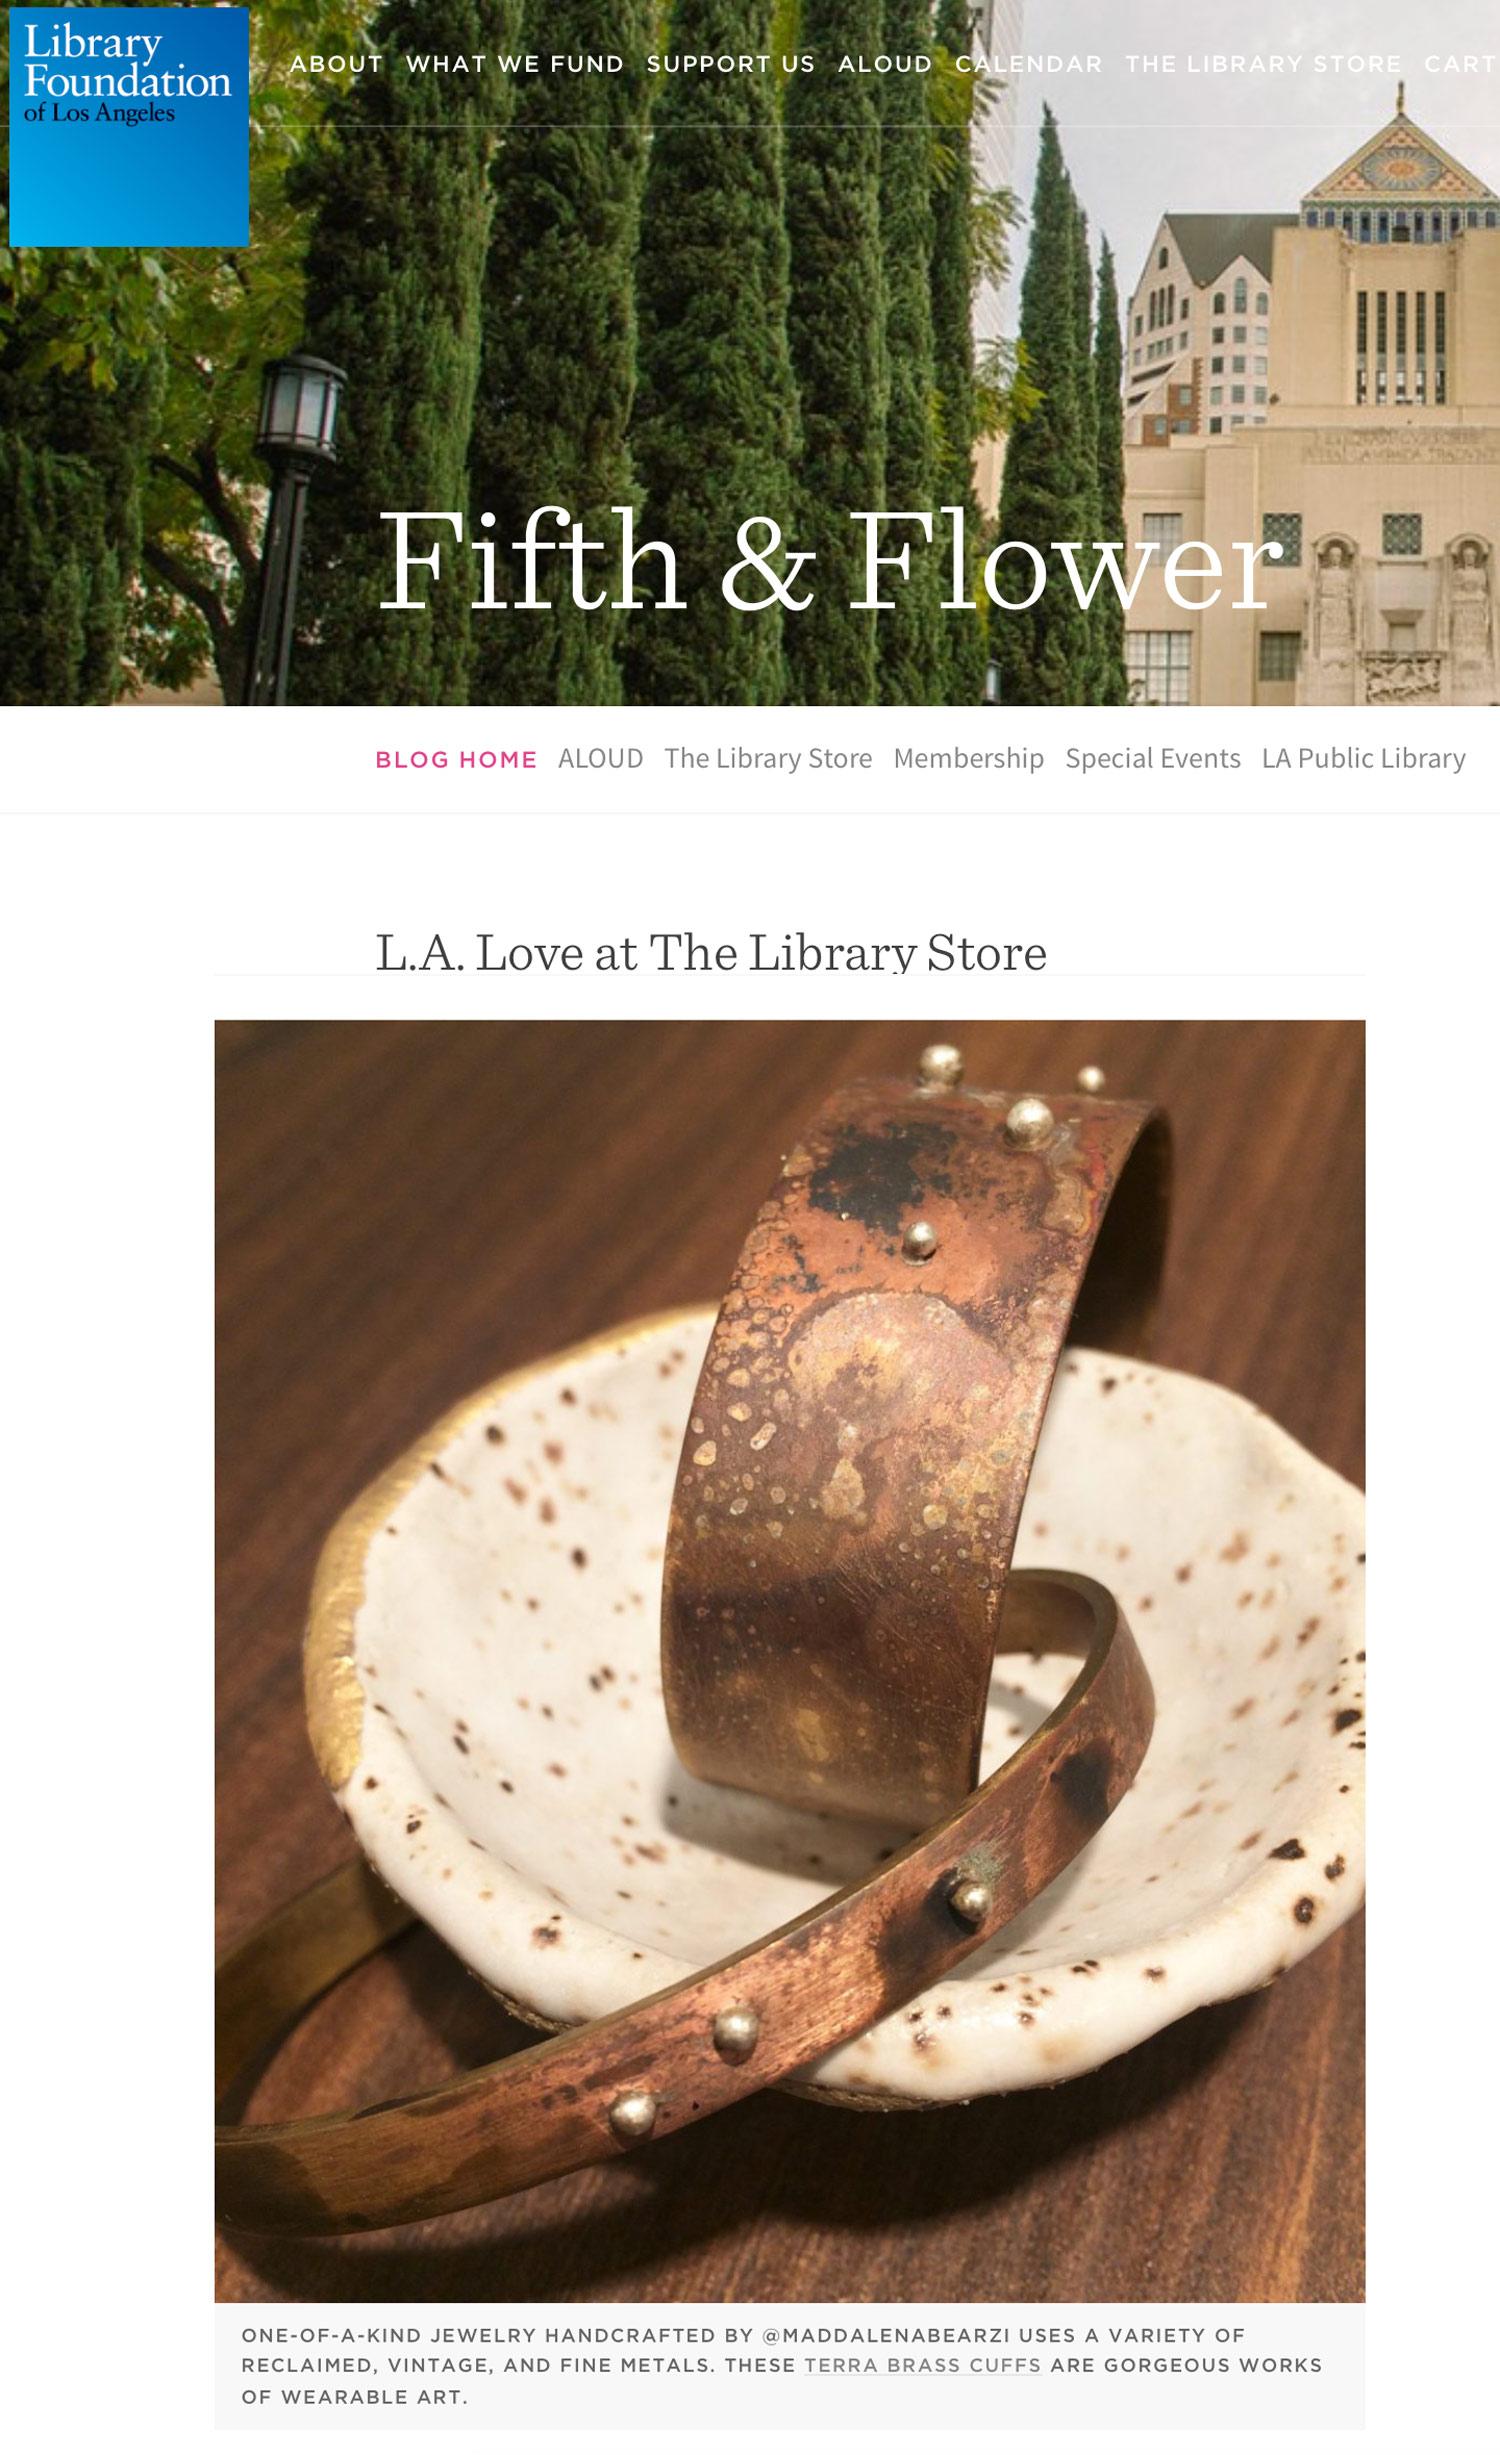 Fifth & Flower